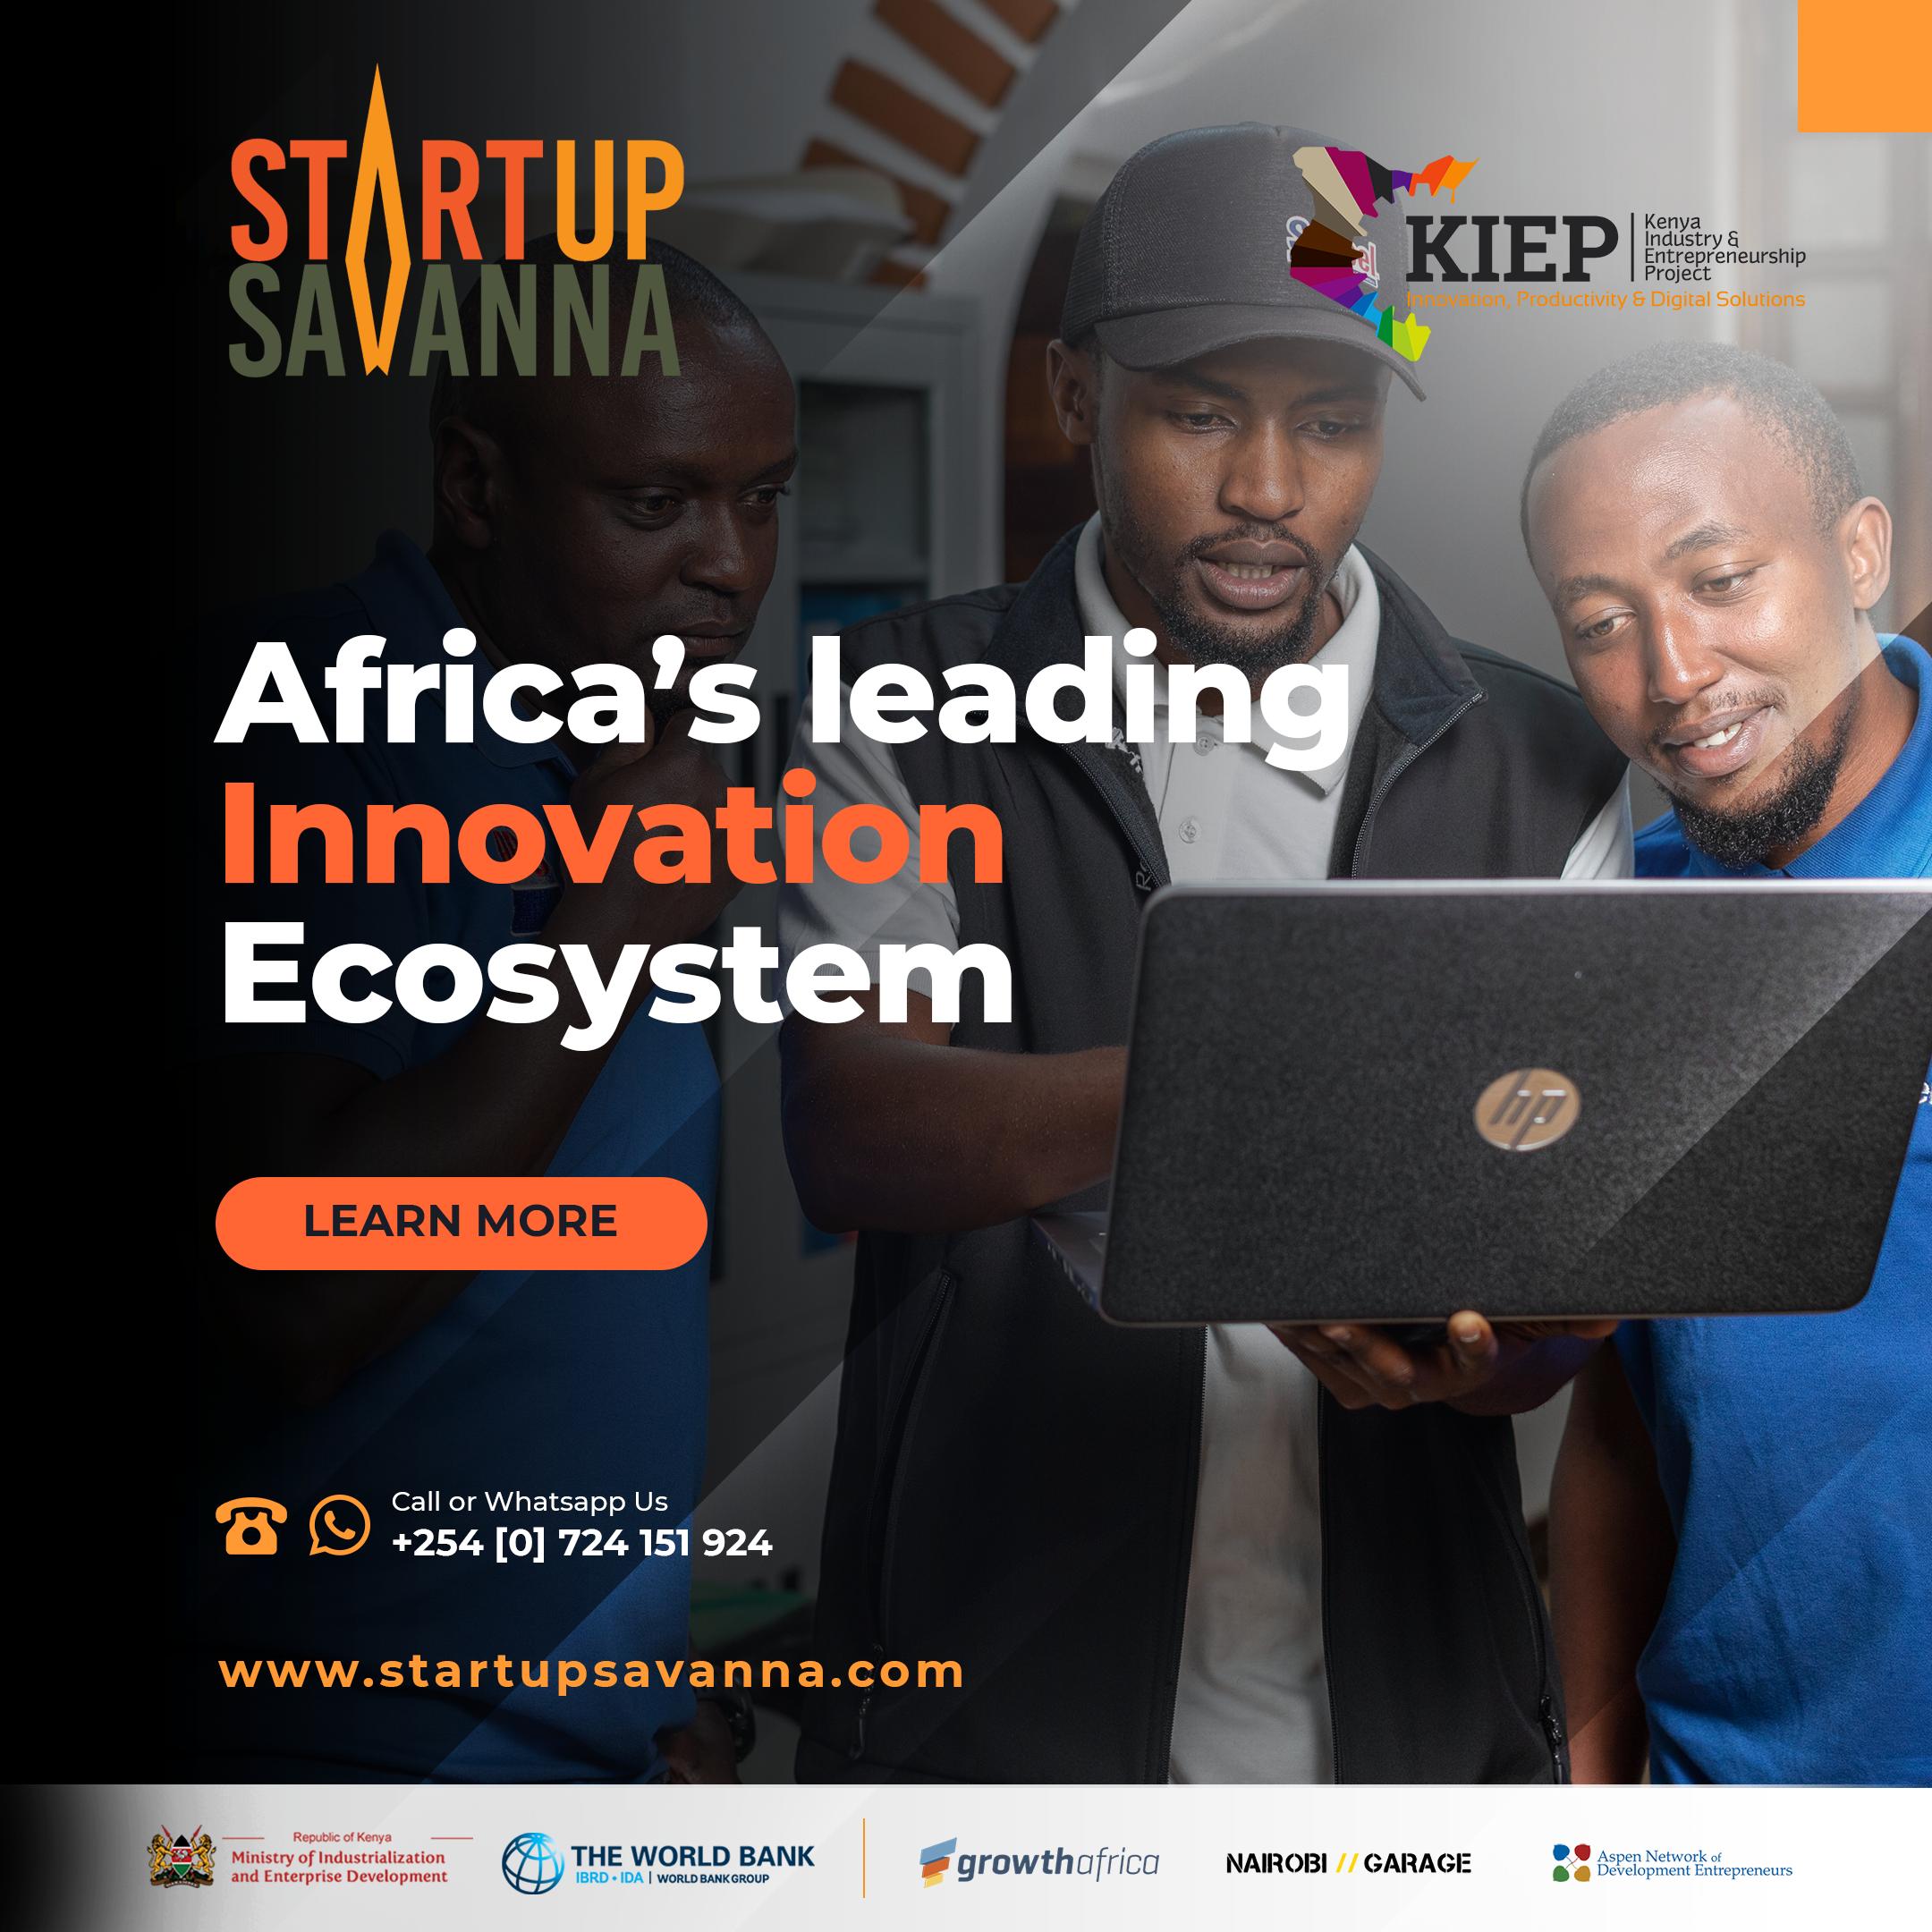 Startup-Savanna-Benefits-4